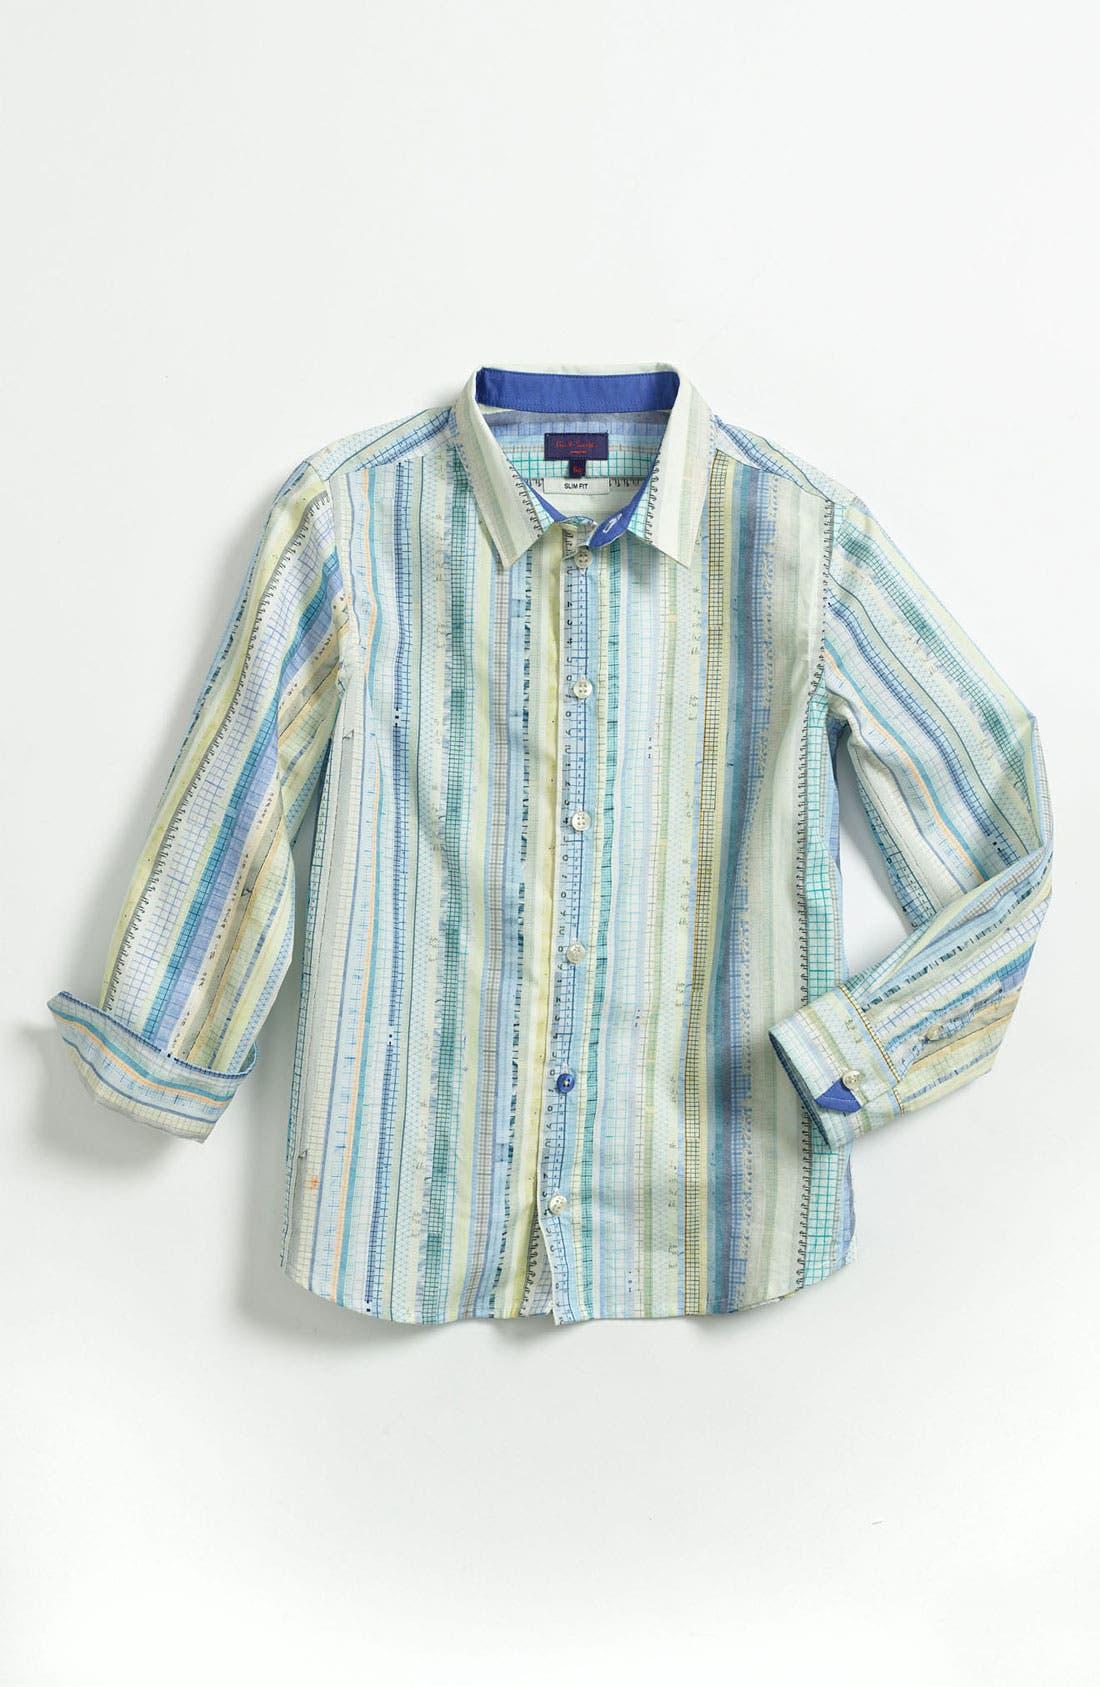 Alternate Image 1 Selected - Paul Smith Junior Dress Shirt (Little Boys & Big Boys)